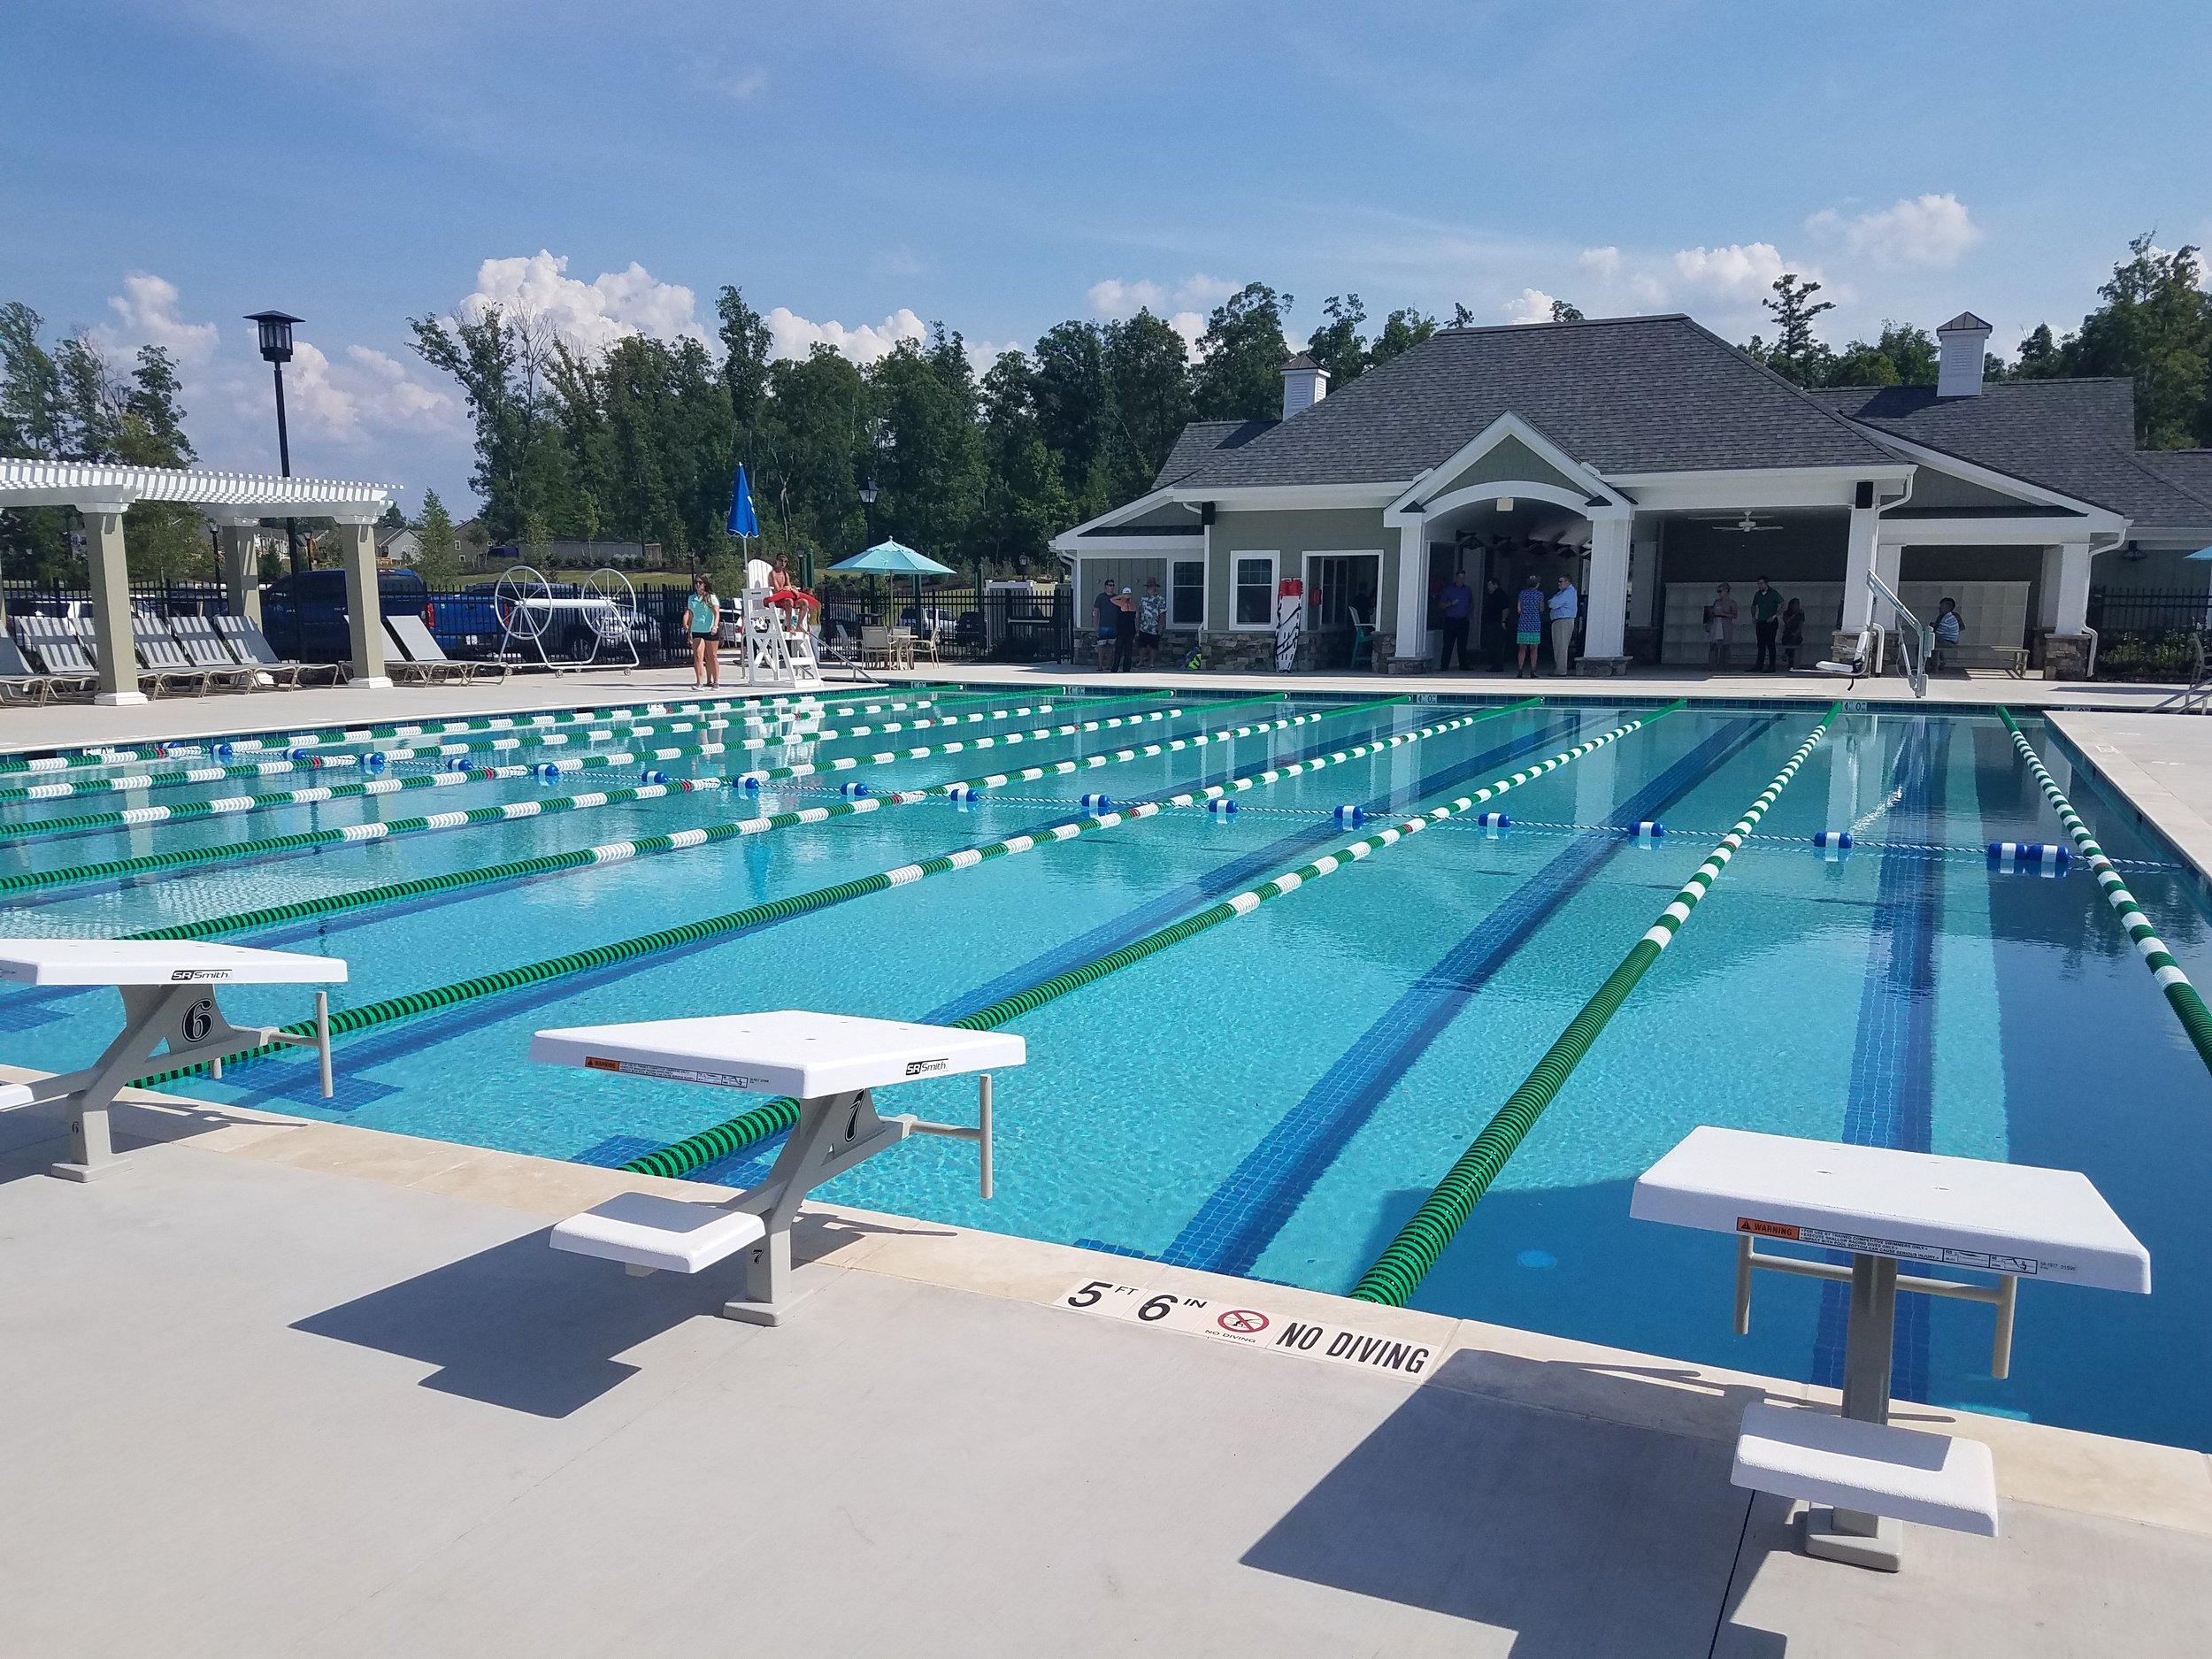 Lap pool at the Magnolia Green Aquatic Center in Moseley, VA